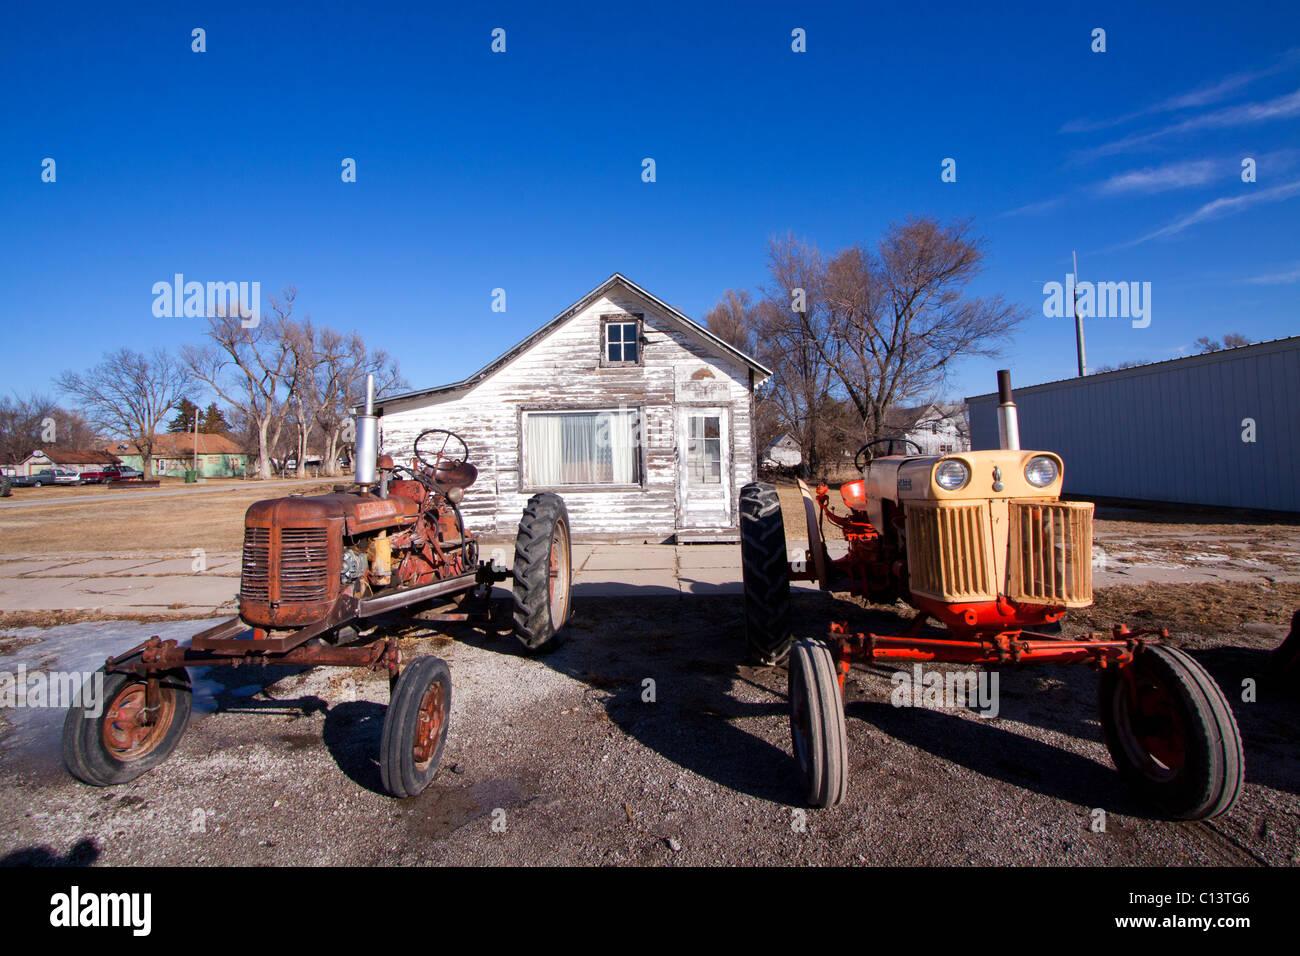 Antique Tractors America Stock Photos & Antique Tractors